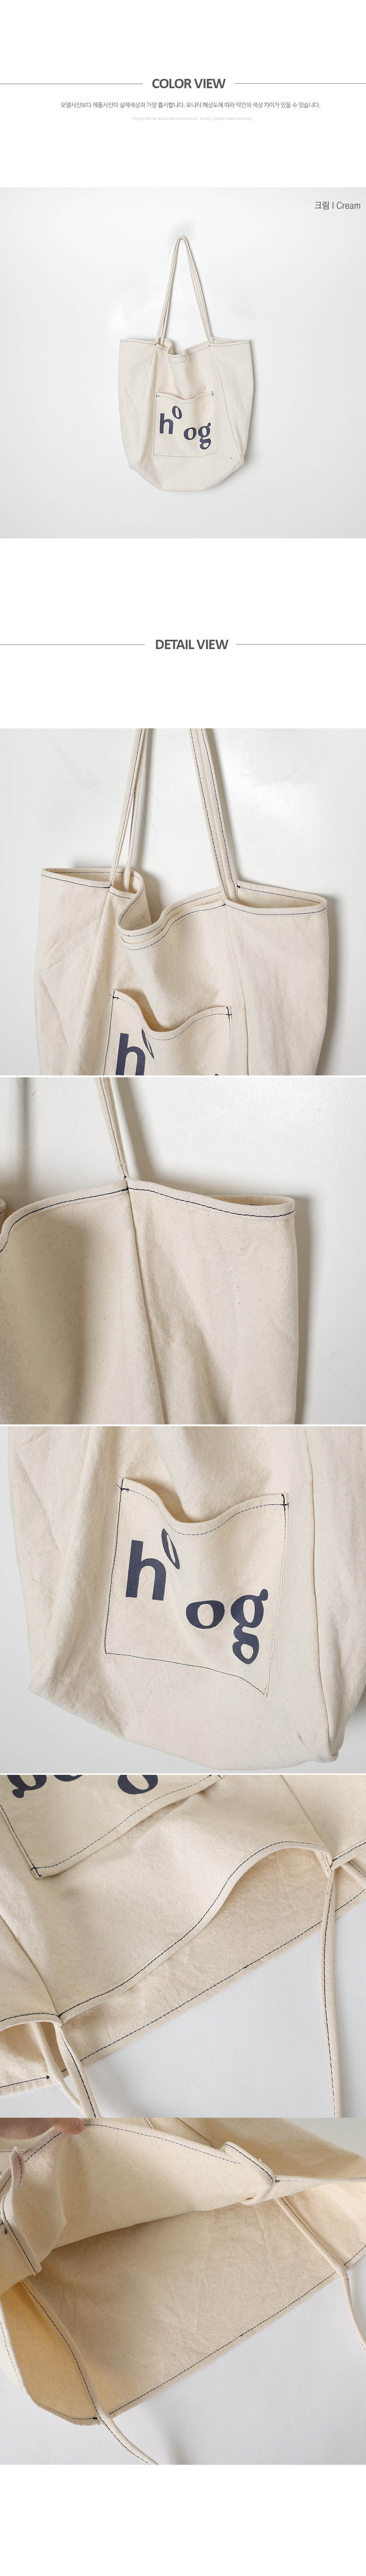 Excellent storage capacity canvas bag